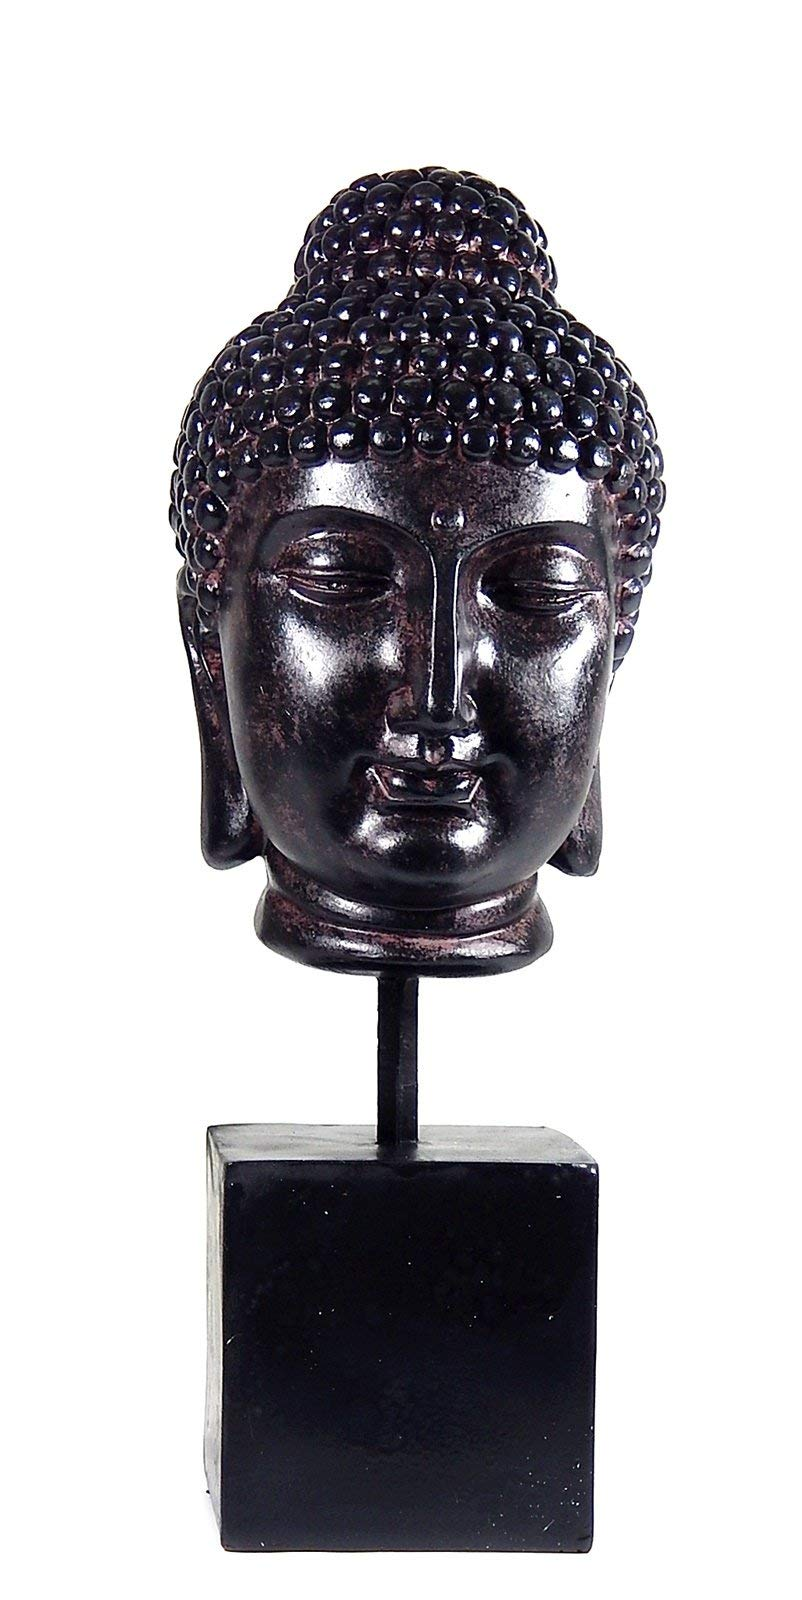 Bellaa 22623 Buddha Head Statue Bust Dhyana Mudra 14 inch by Bellaa